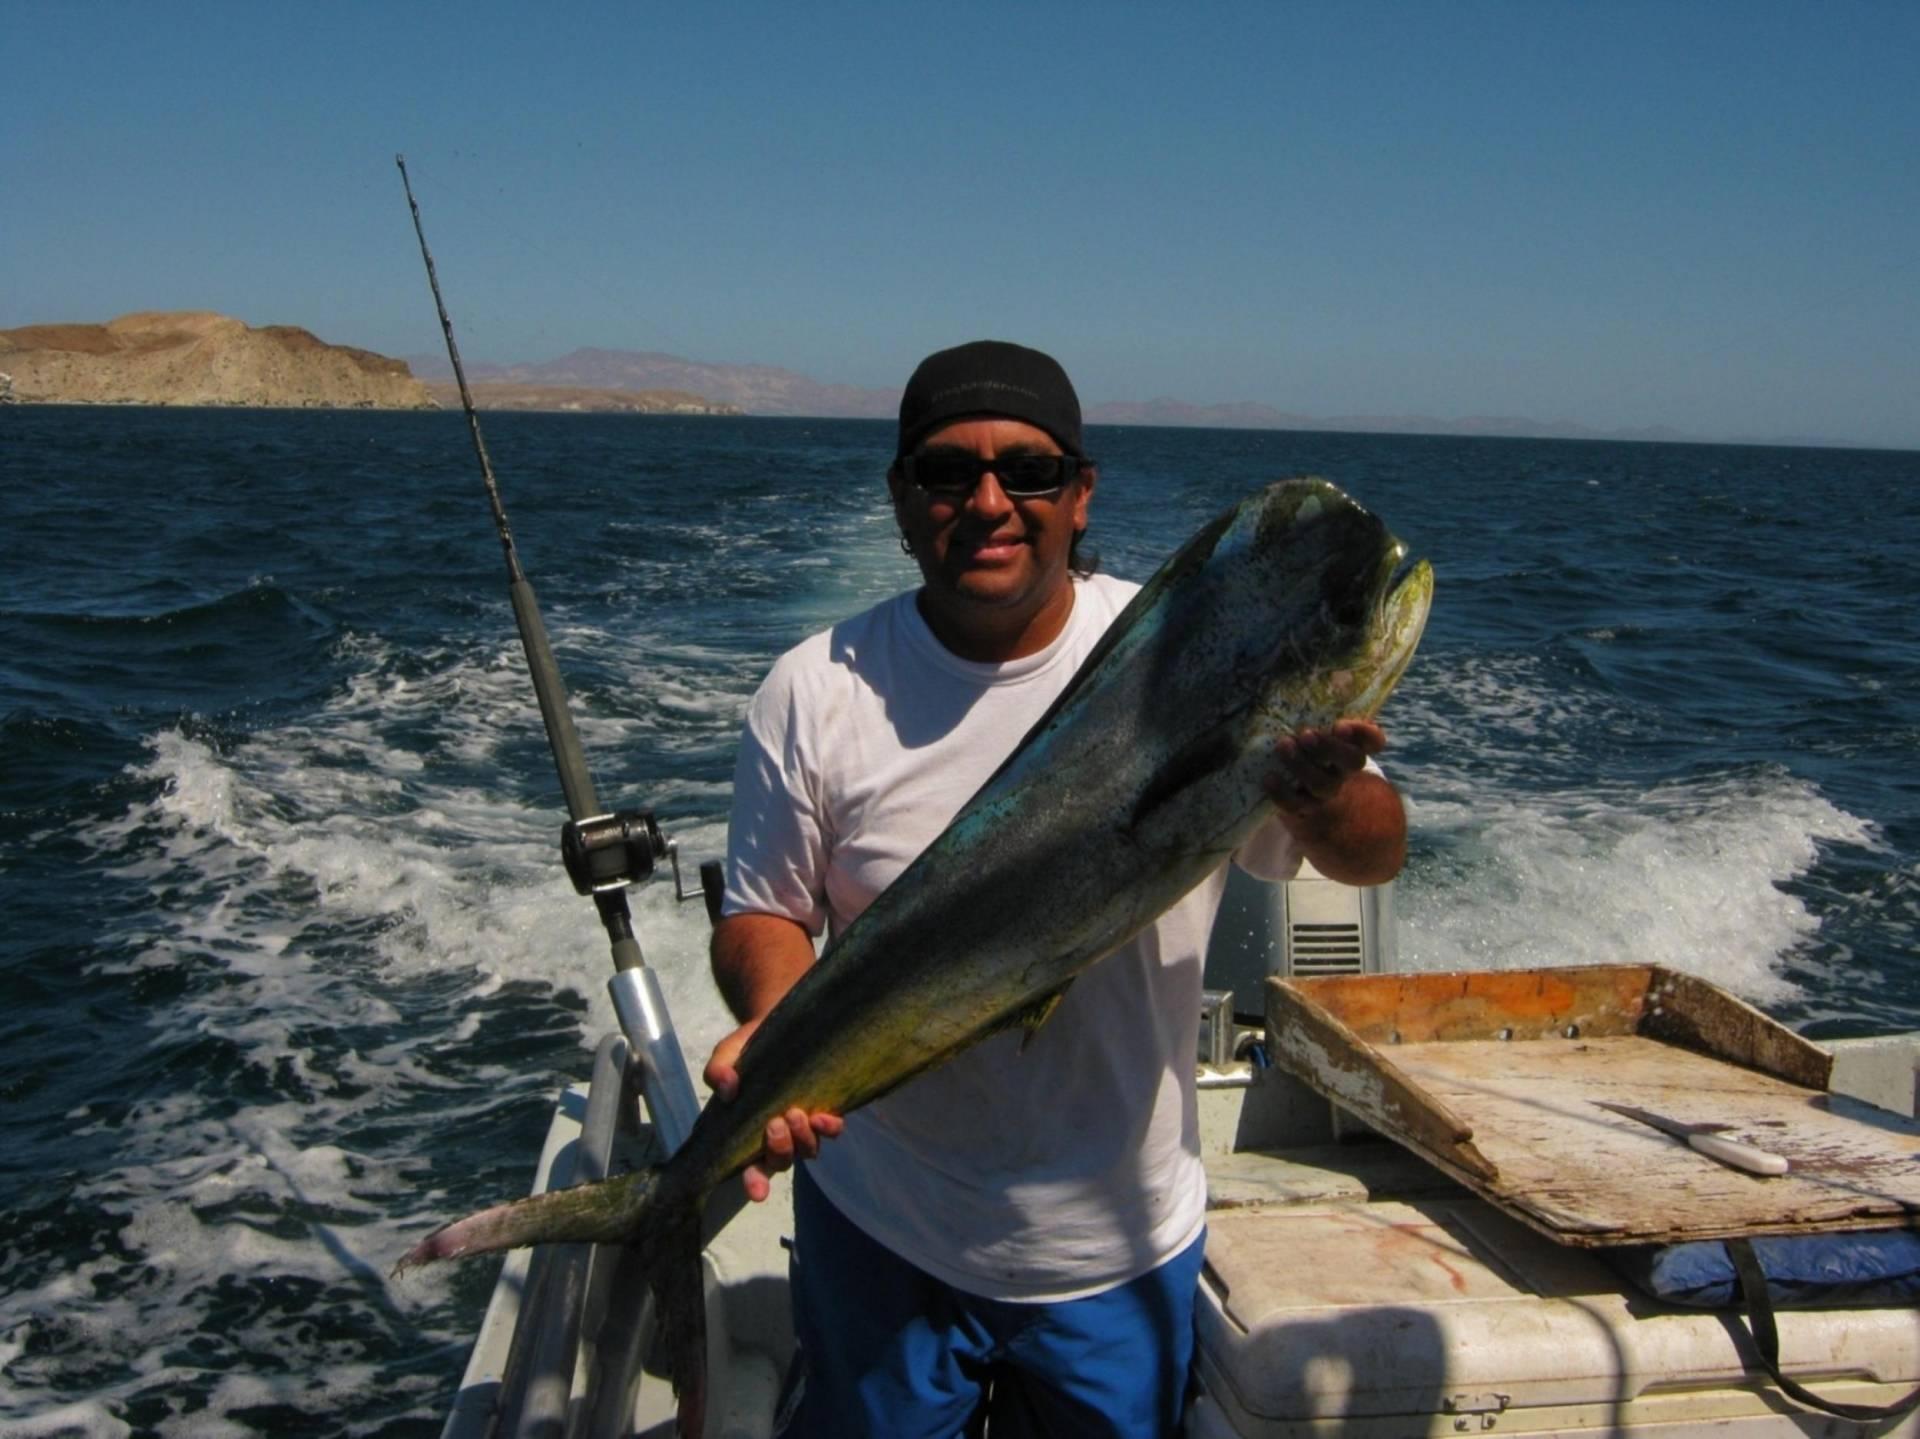 Bahia de los angeles 9 24 9 25 saltwater fishing forums for Fishing in los angeles